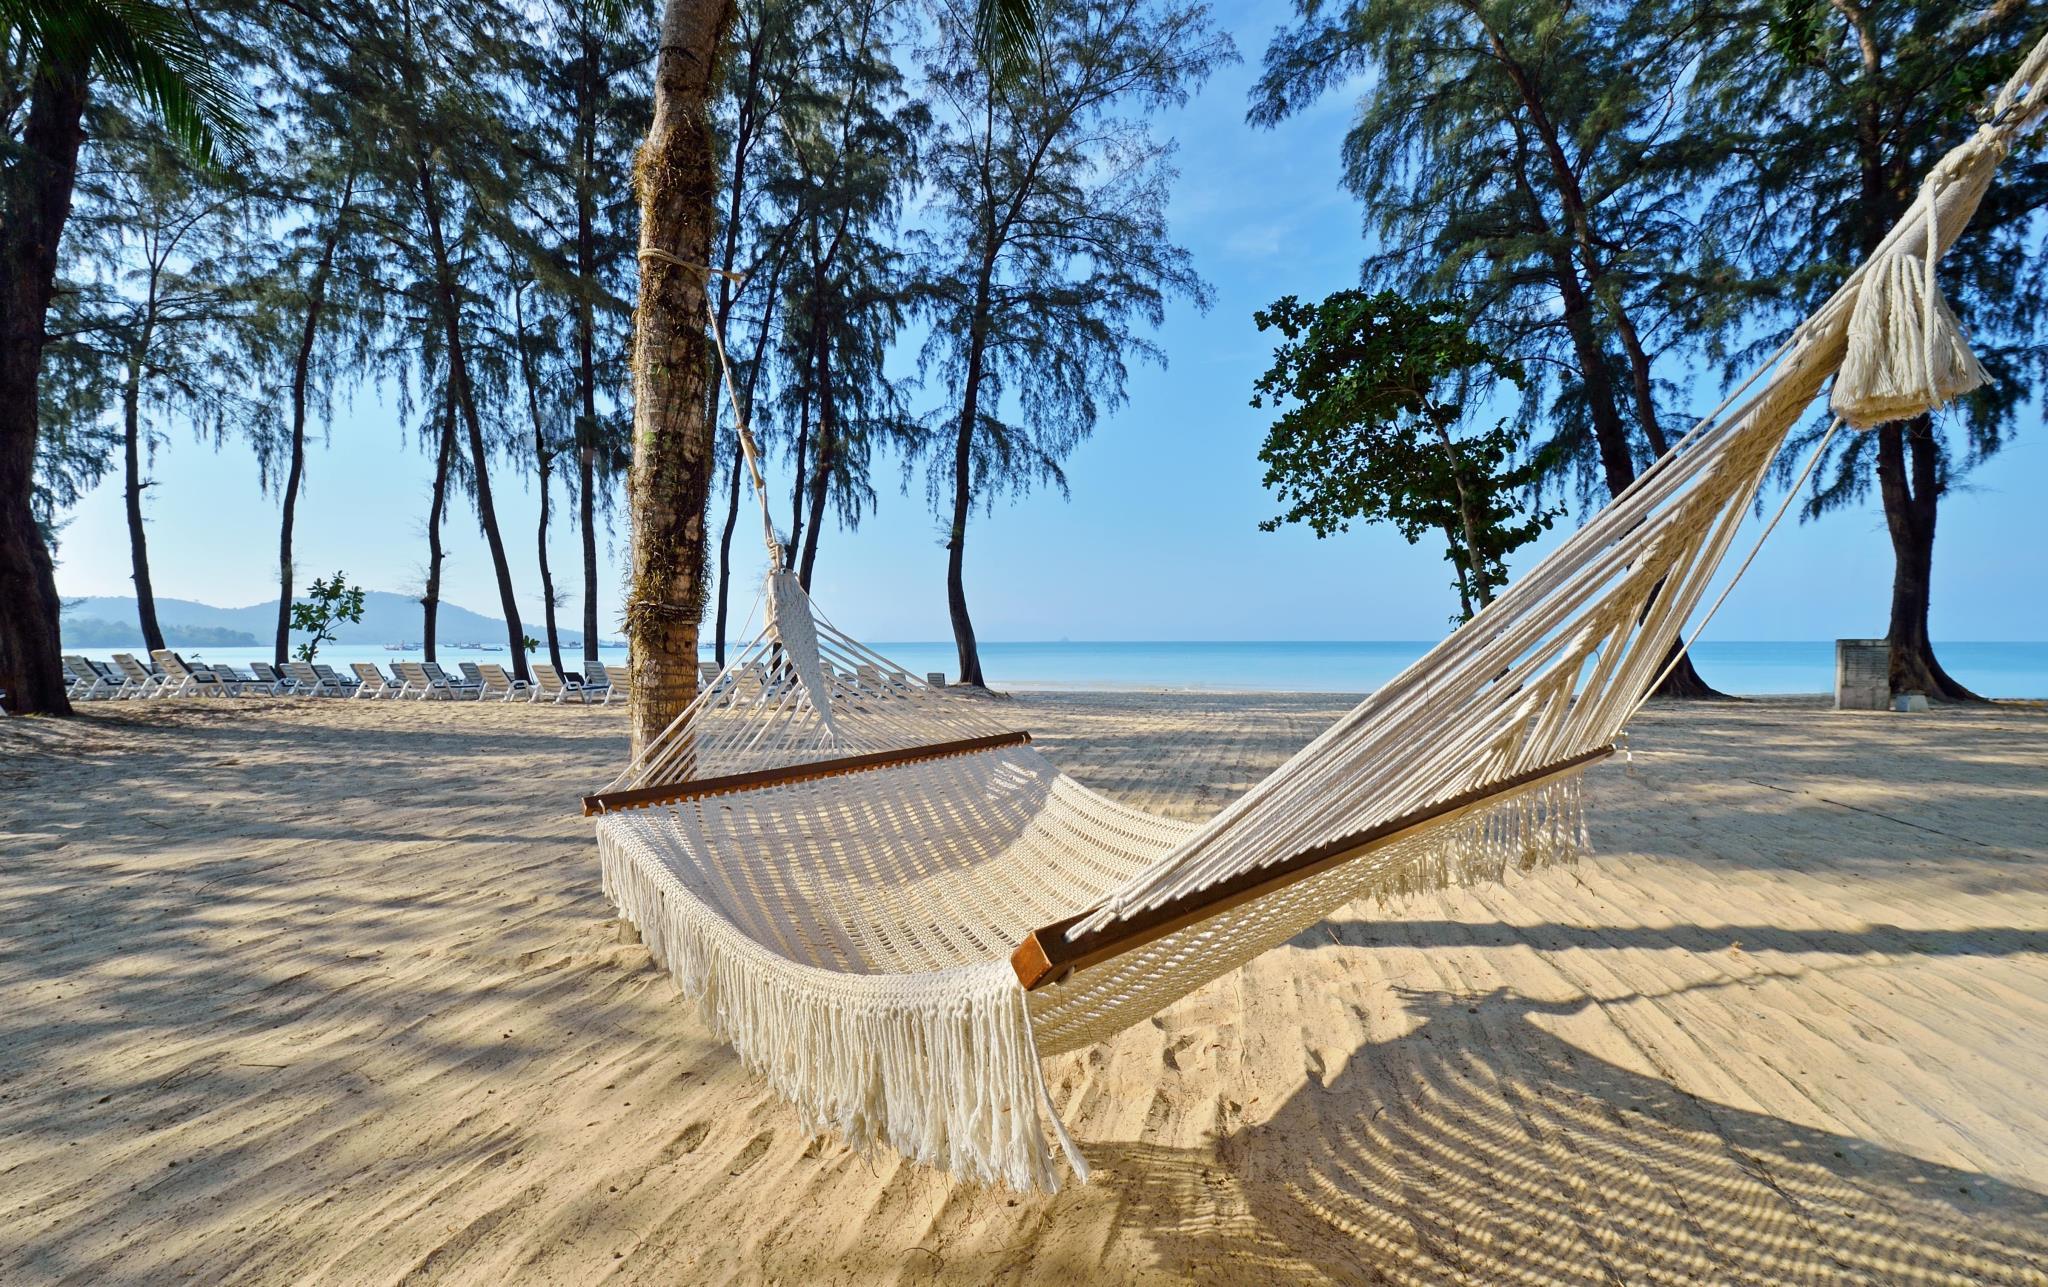 Dusit Thani Krabi Beach Resort - Krabi